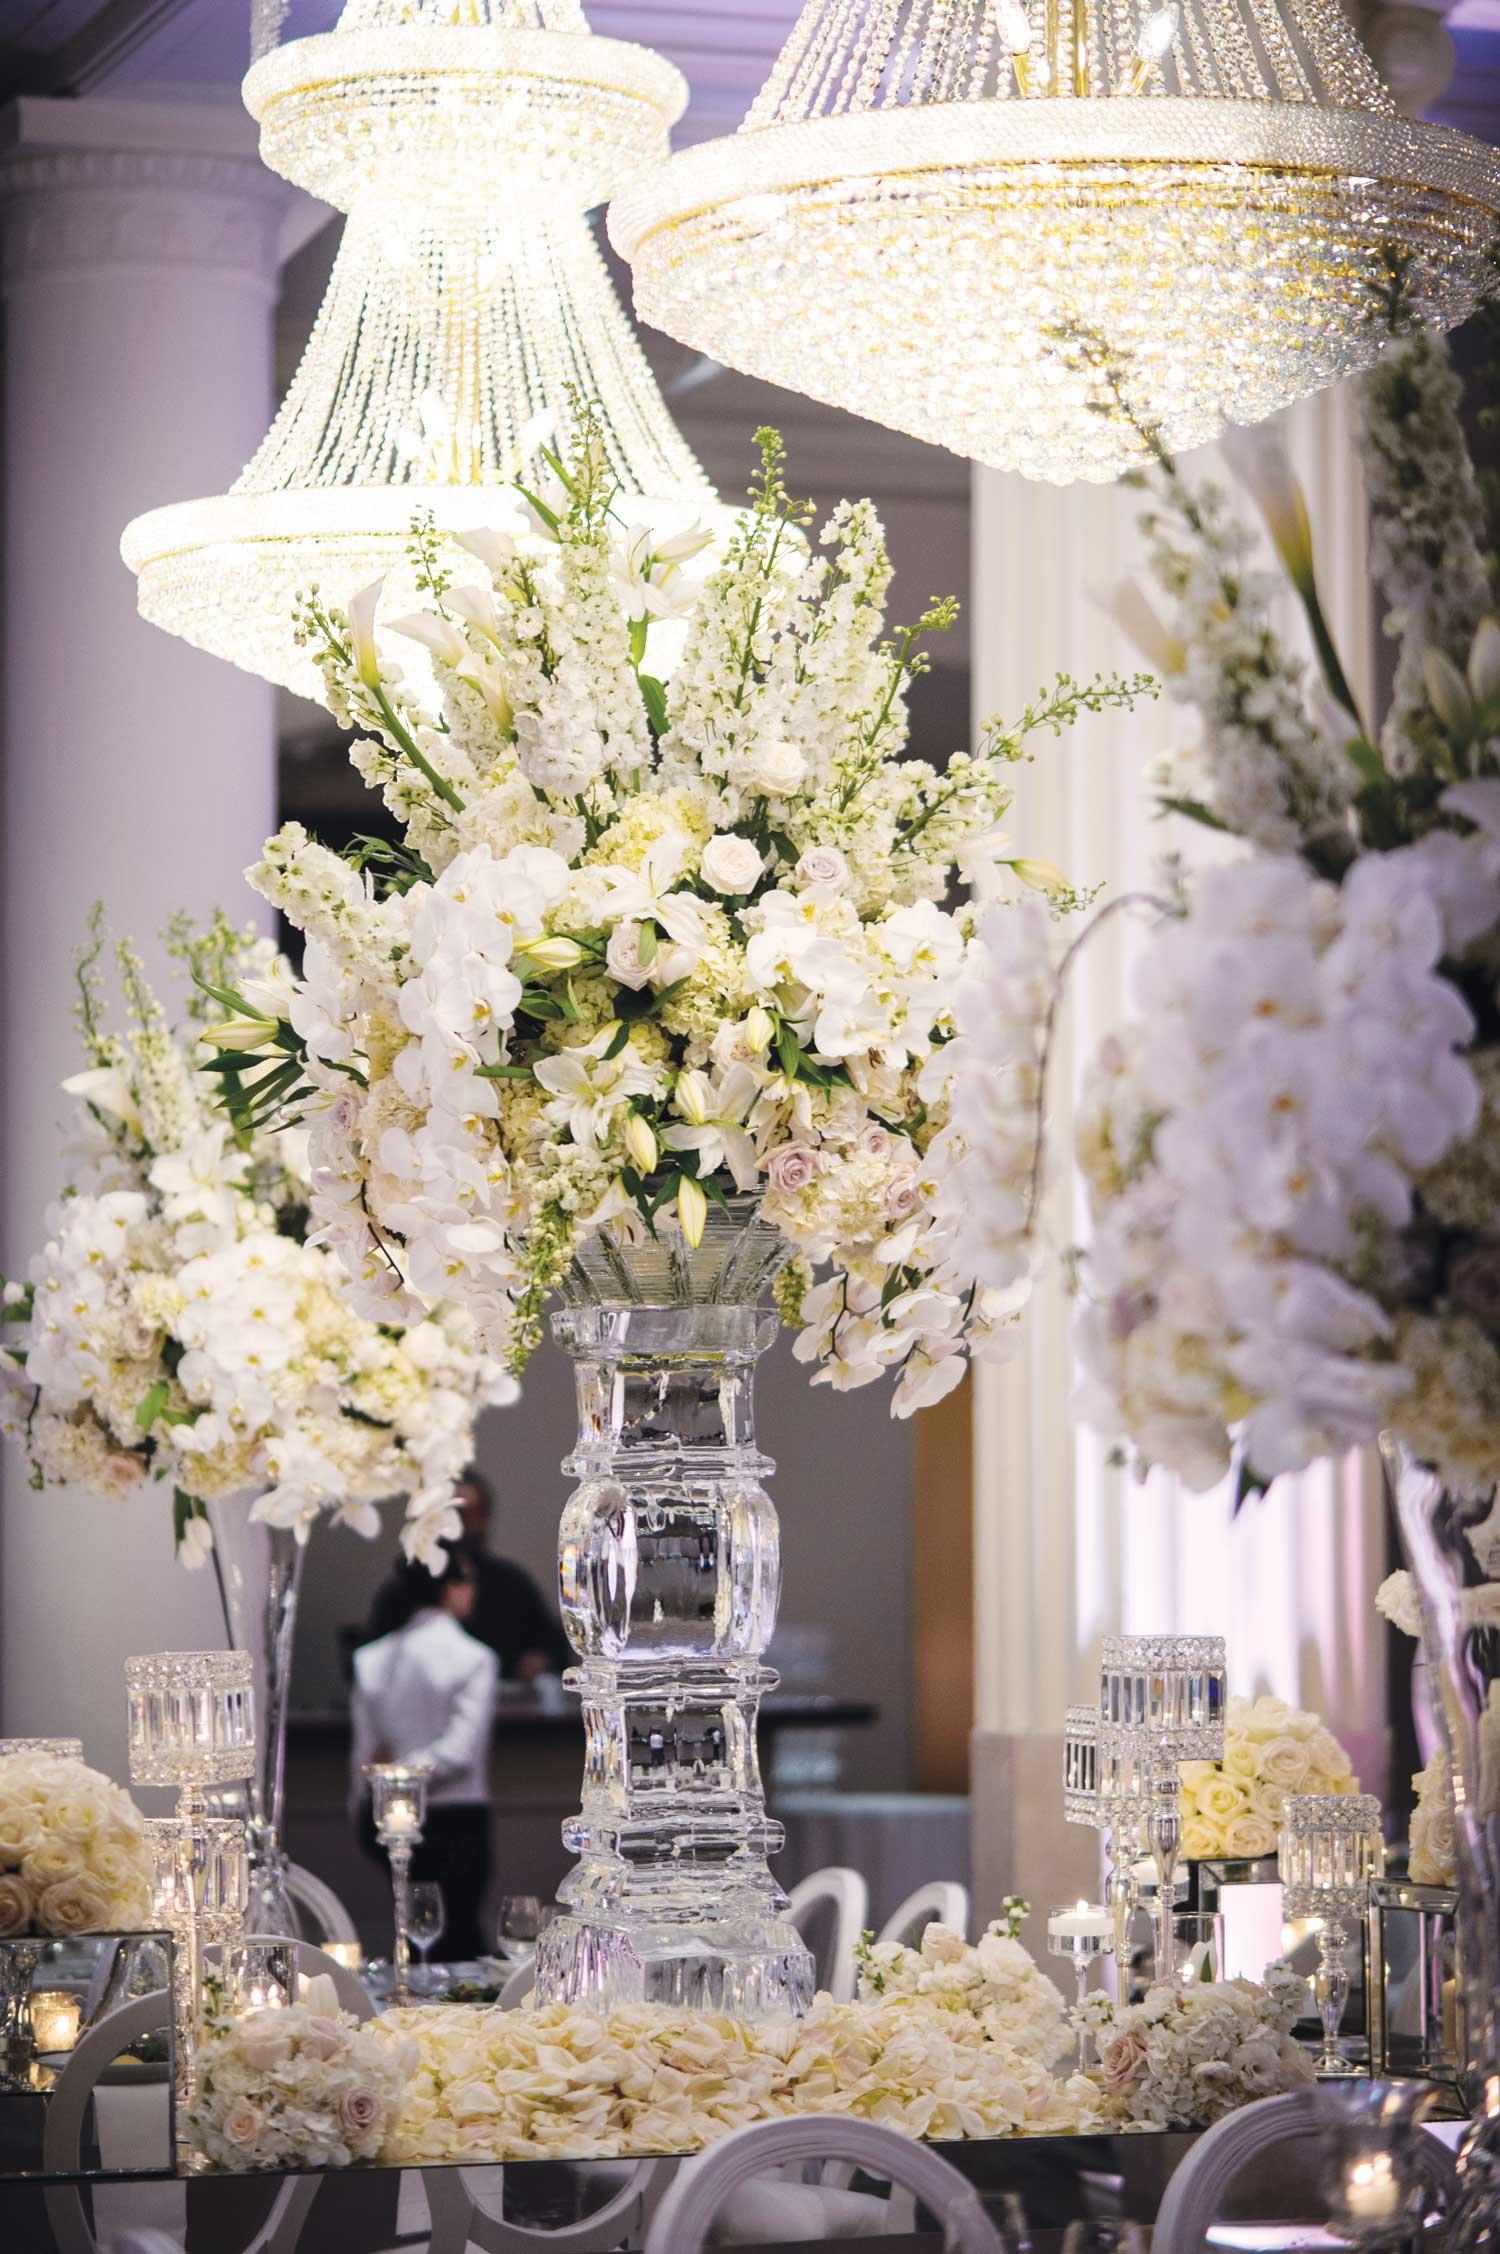 inside weddings winter 2019 issue preview white centerpiece wedding reception chandelier